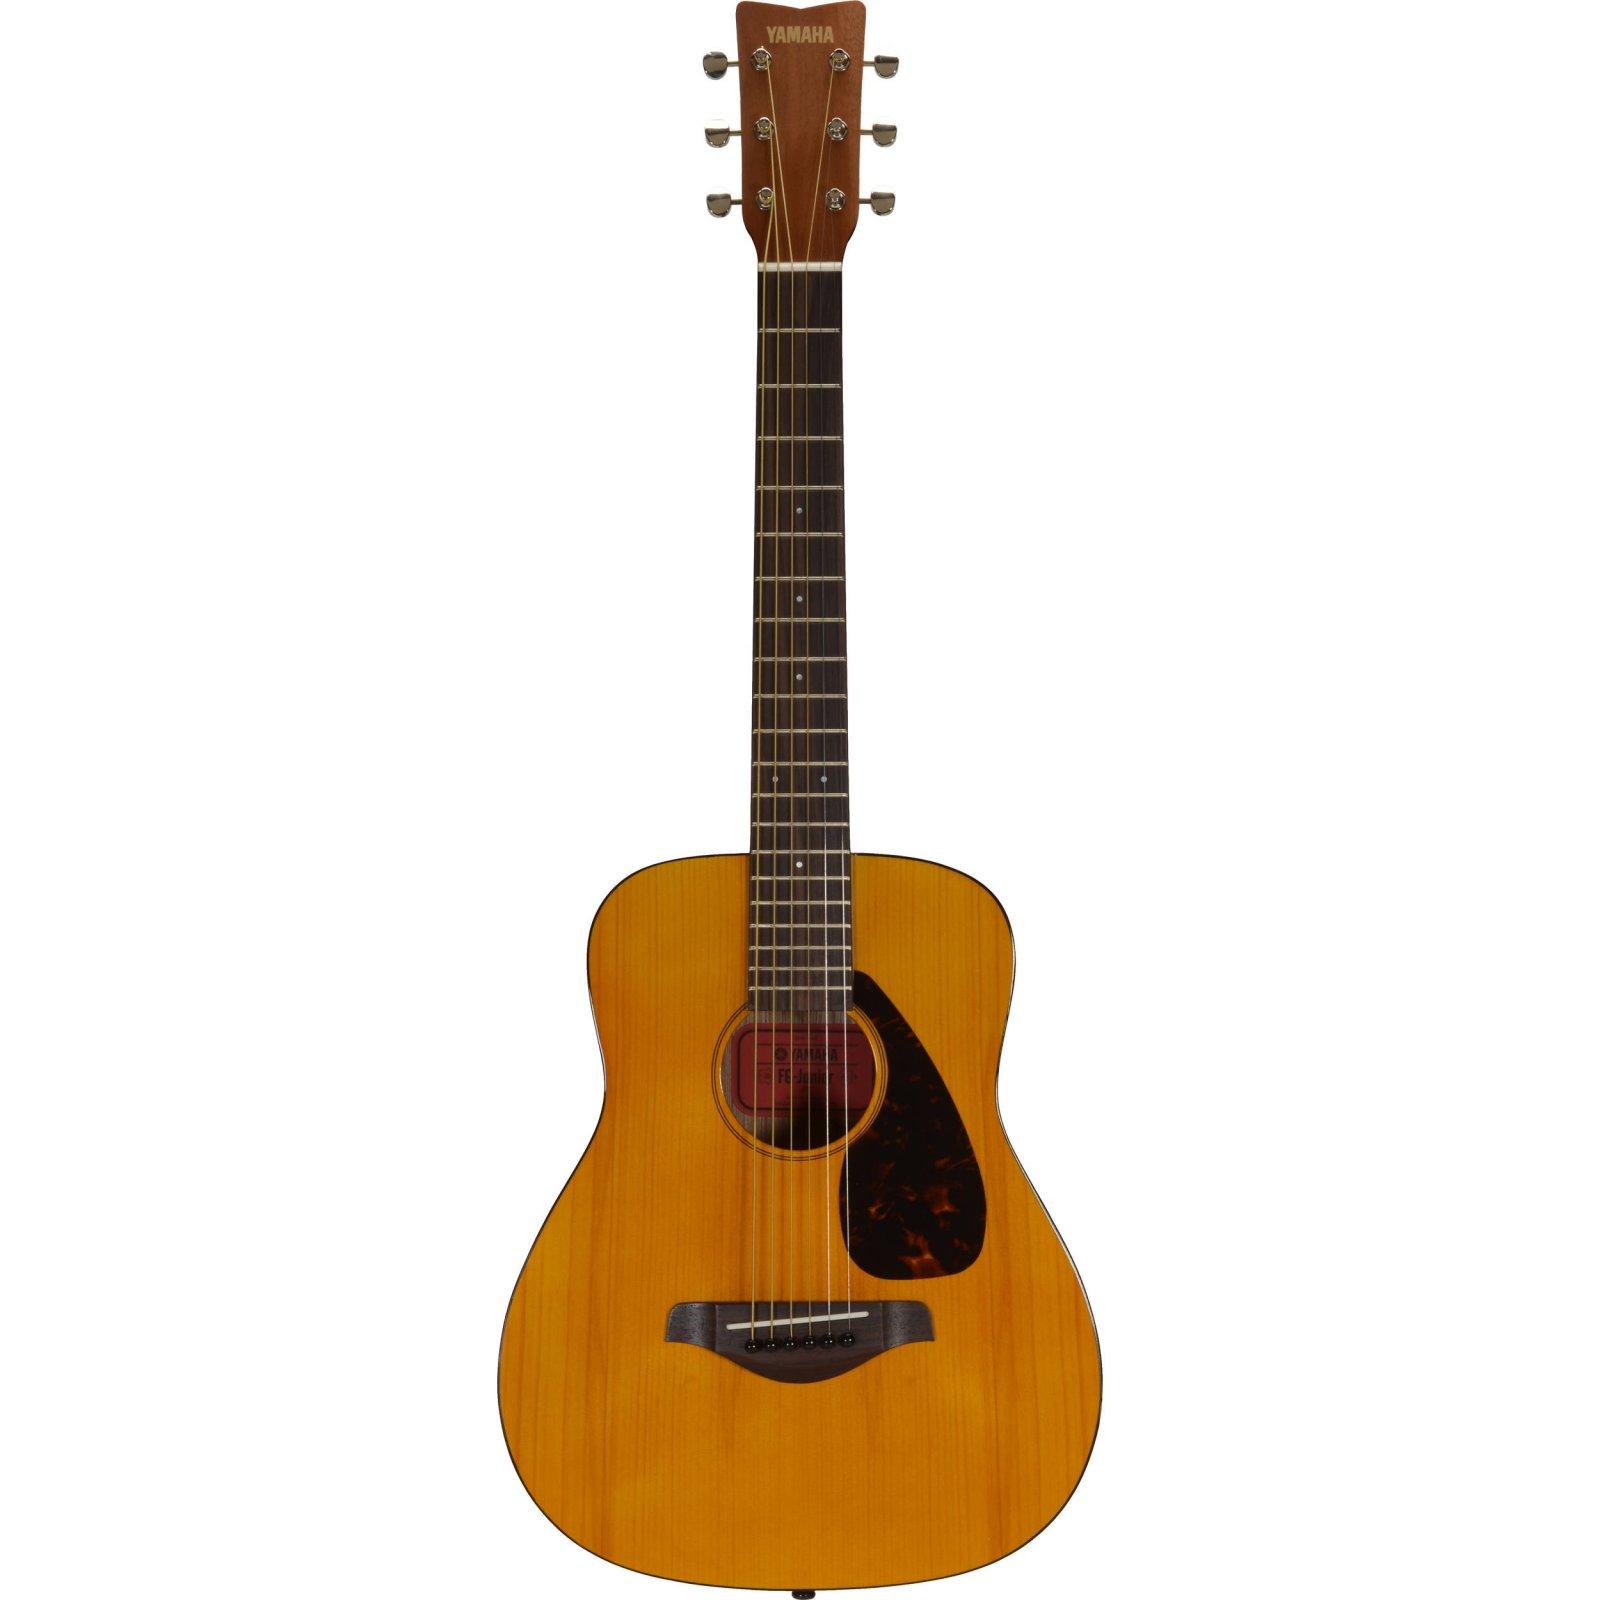 Yamaha JR1 1/2 Scale Folk Acoustic Guitar (Meranti) w/black bag